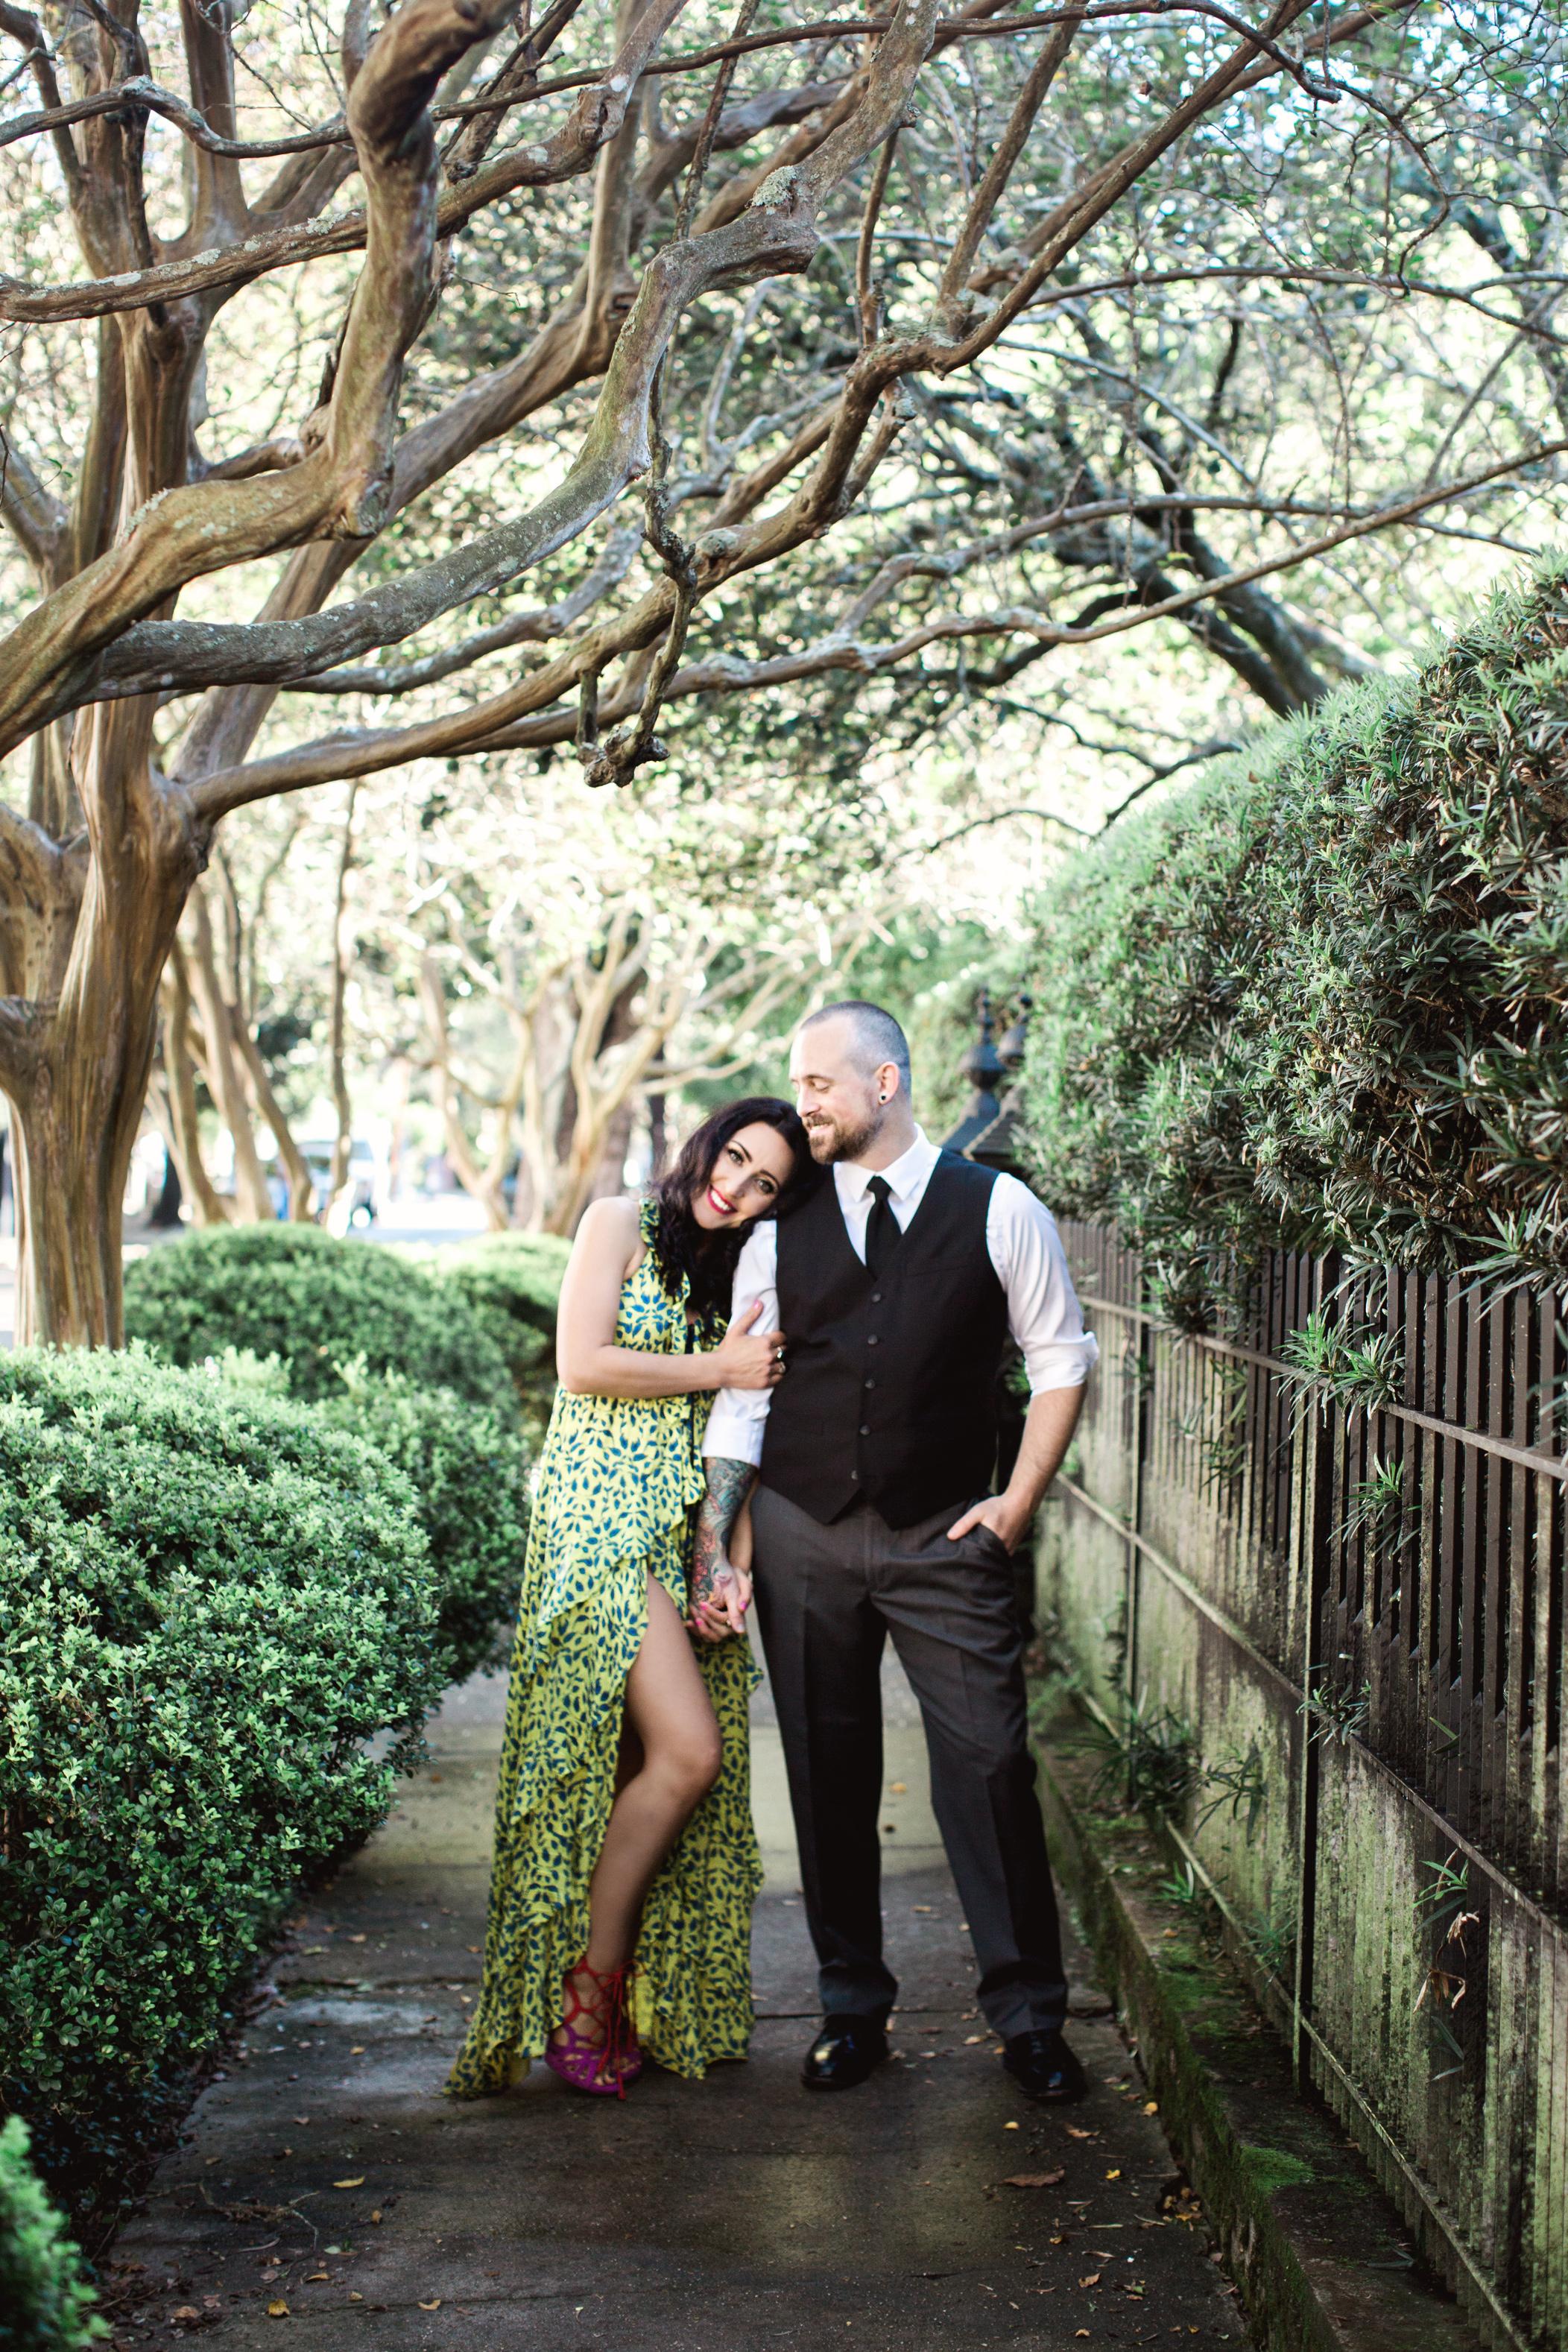 CindyGiovagnoliPhotography_Seattle_Washington_PNW_Couple_Engagement_Portrait_Photography-021.jpg